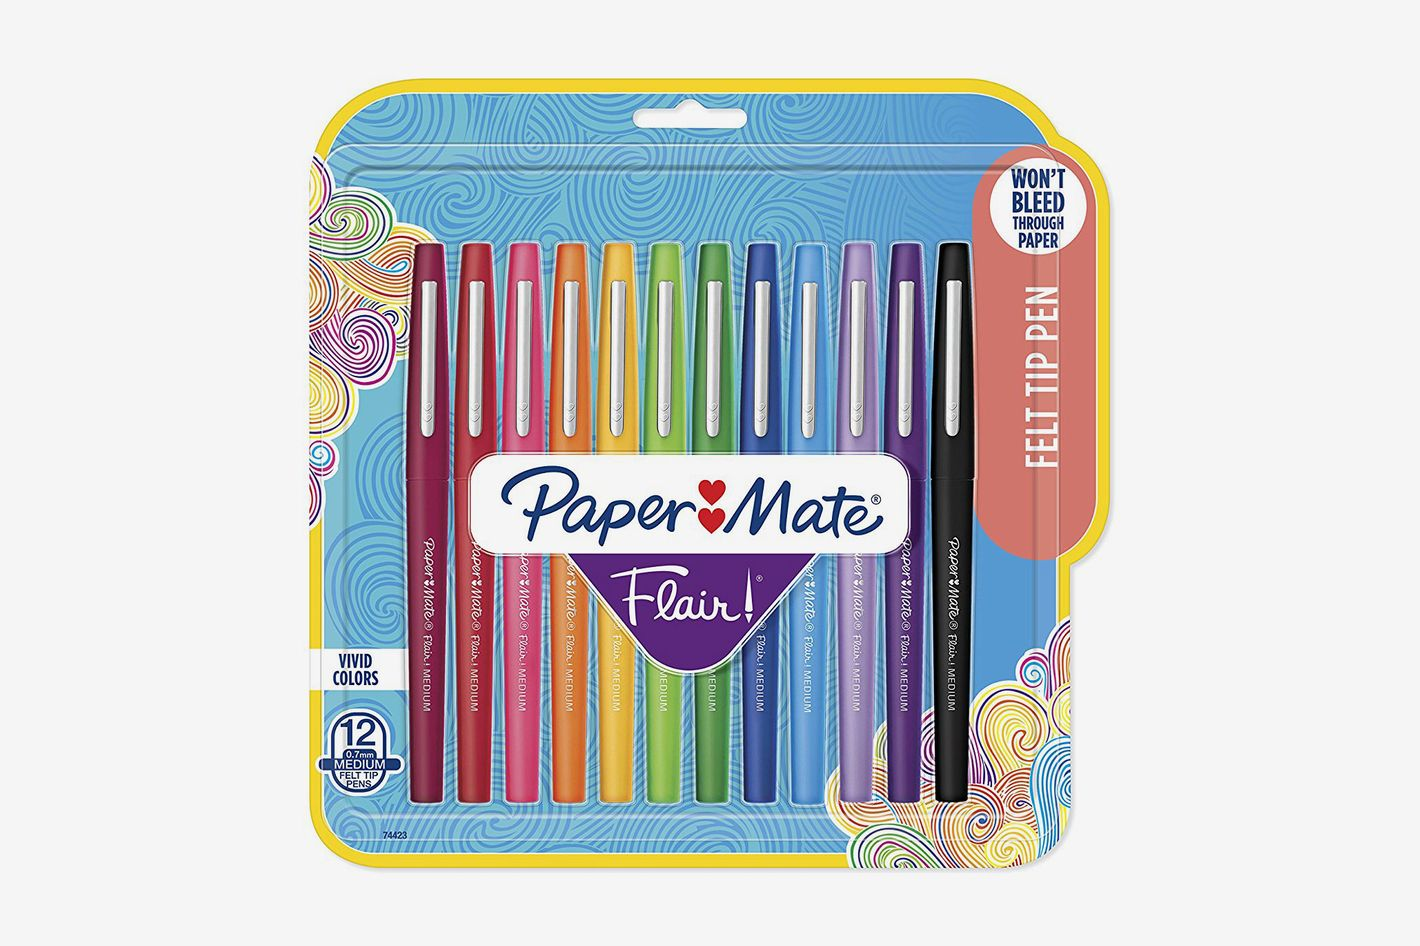 Paper Mate Flair Felt Tip Pens, 12 Count